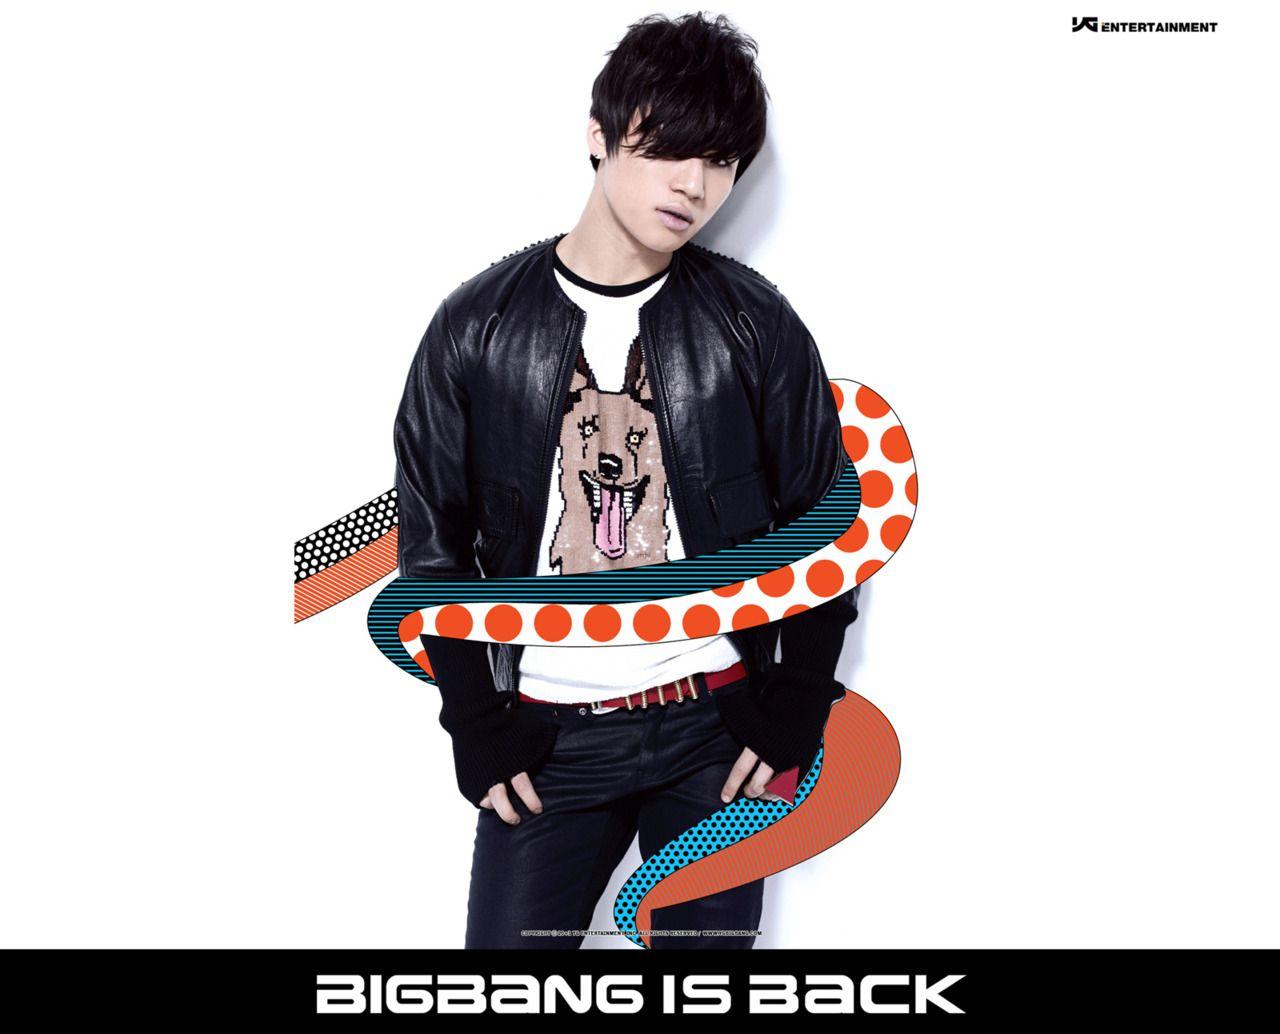 Best Korean Art Wallpaper: Daesung 'Big Bang Is Back' HD Wallpaper. Download BIGBANG #BIGBANG, #Daesung Dekstop Background HD Quality